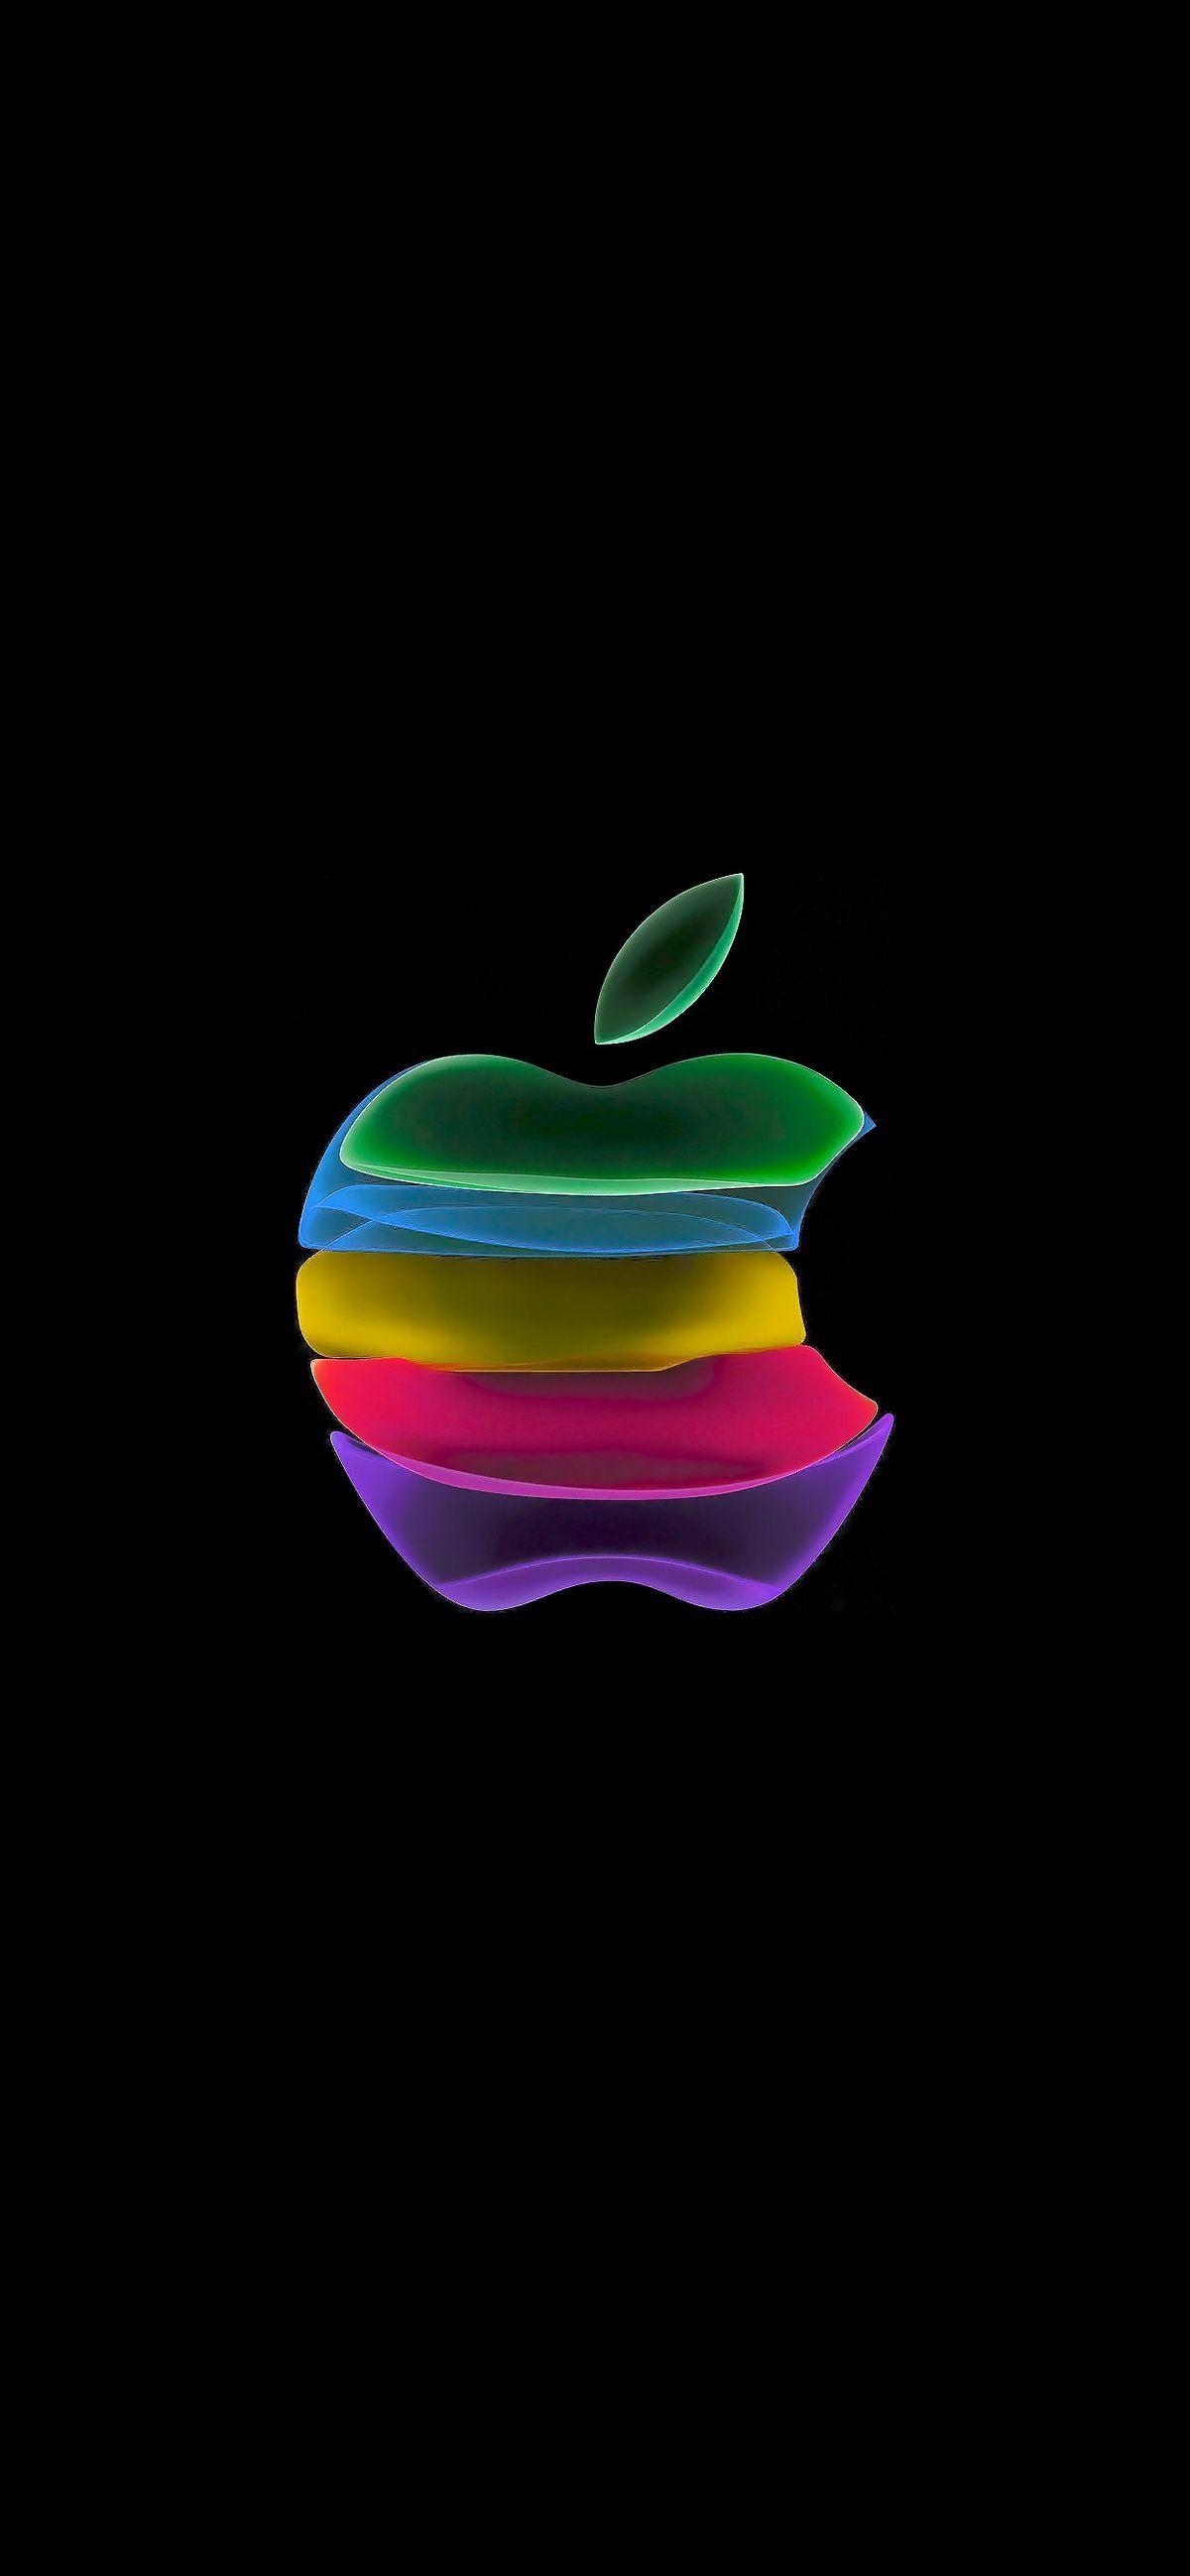 Pin By Ghazi Aljbur On Fondos De Pantalla Apple Logo Wallpaper Iphone Apple Iphone Wallpaper Hd Apple Logo Wallpaper